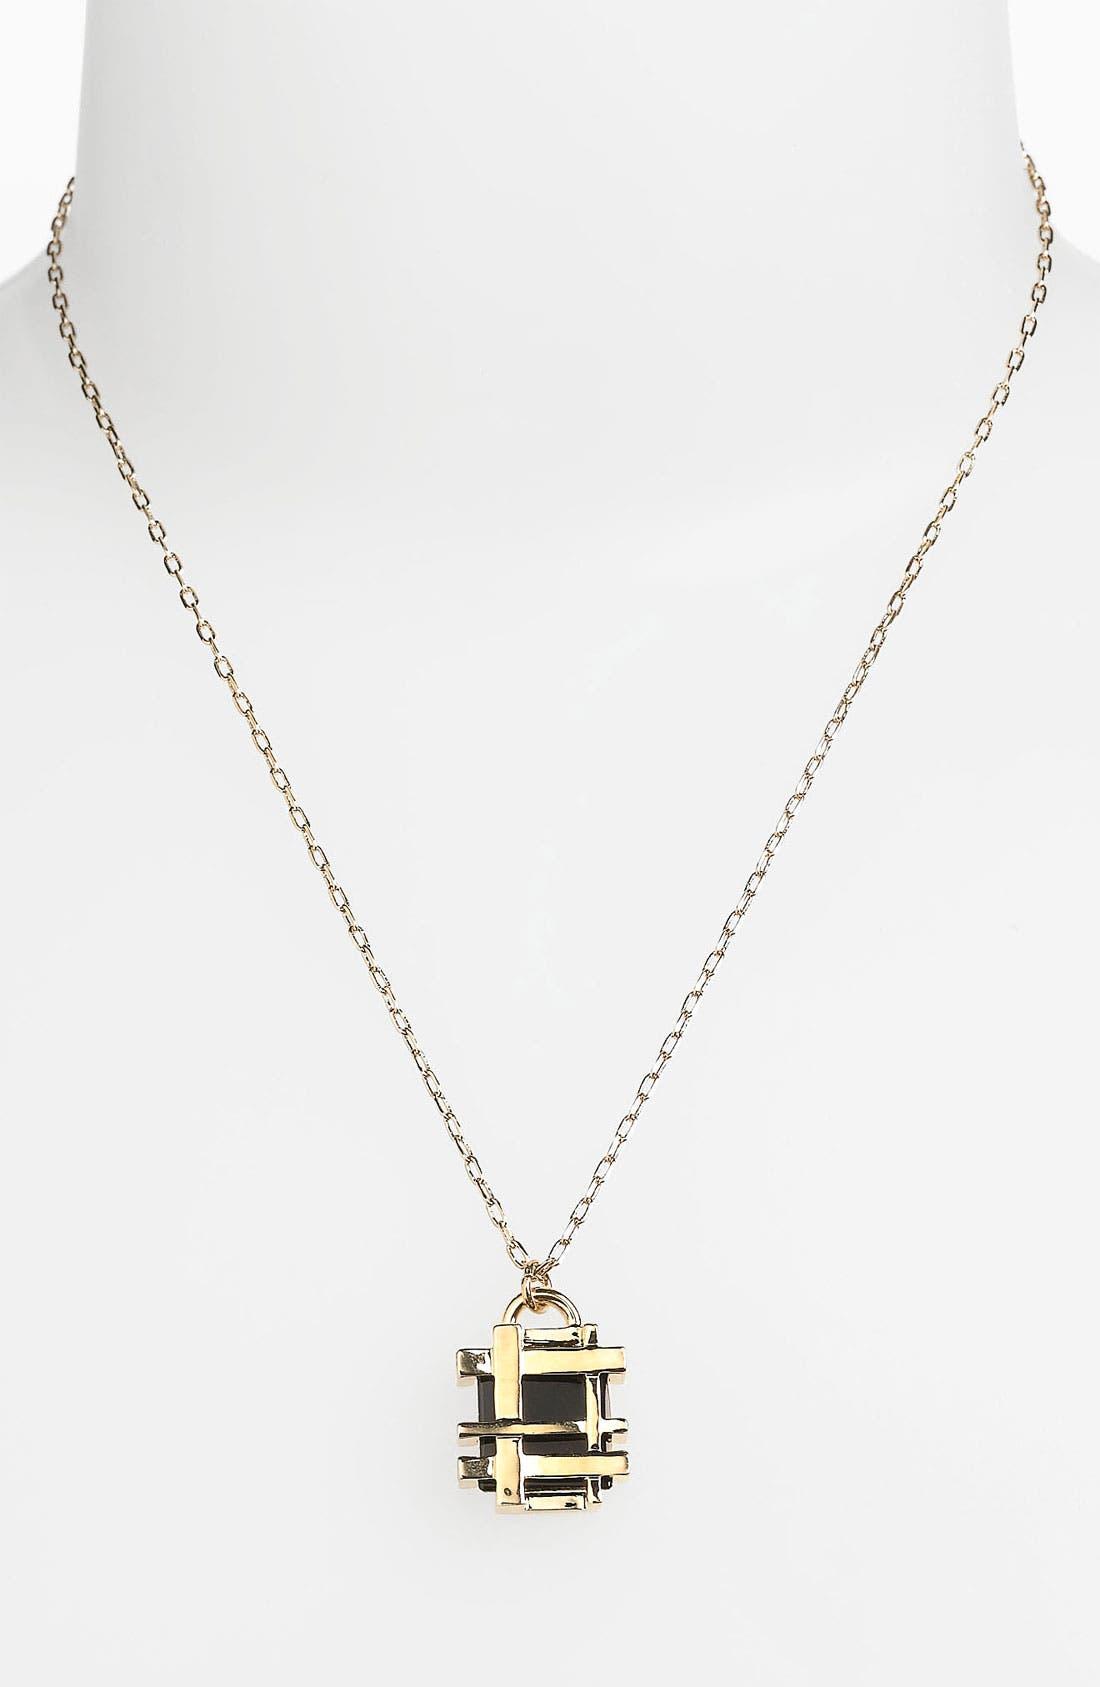 Alternate Image 1 Selected - Tory Burch 'Mini' Pendant Necklace